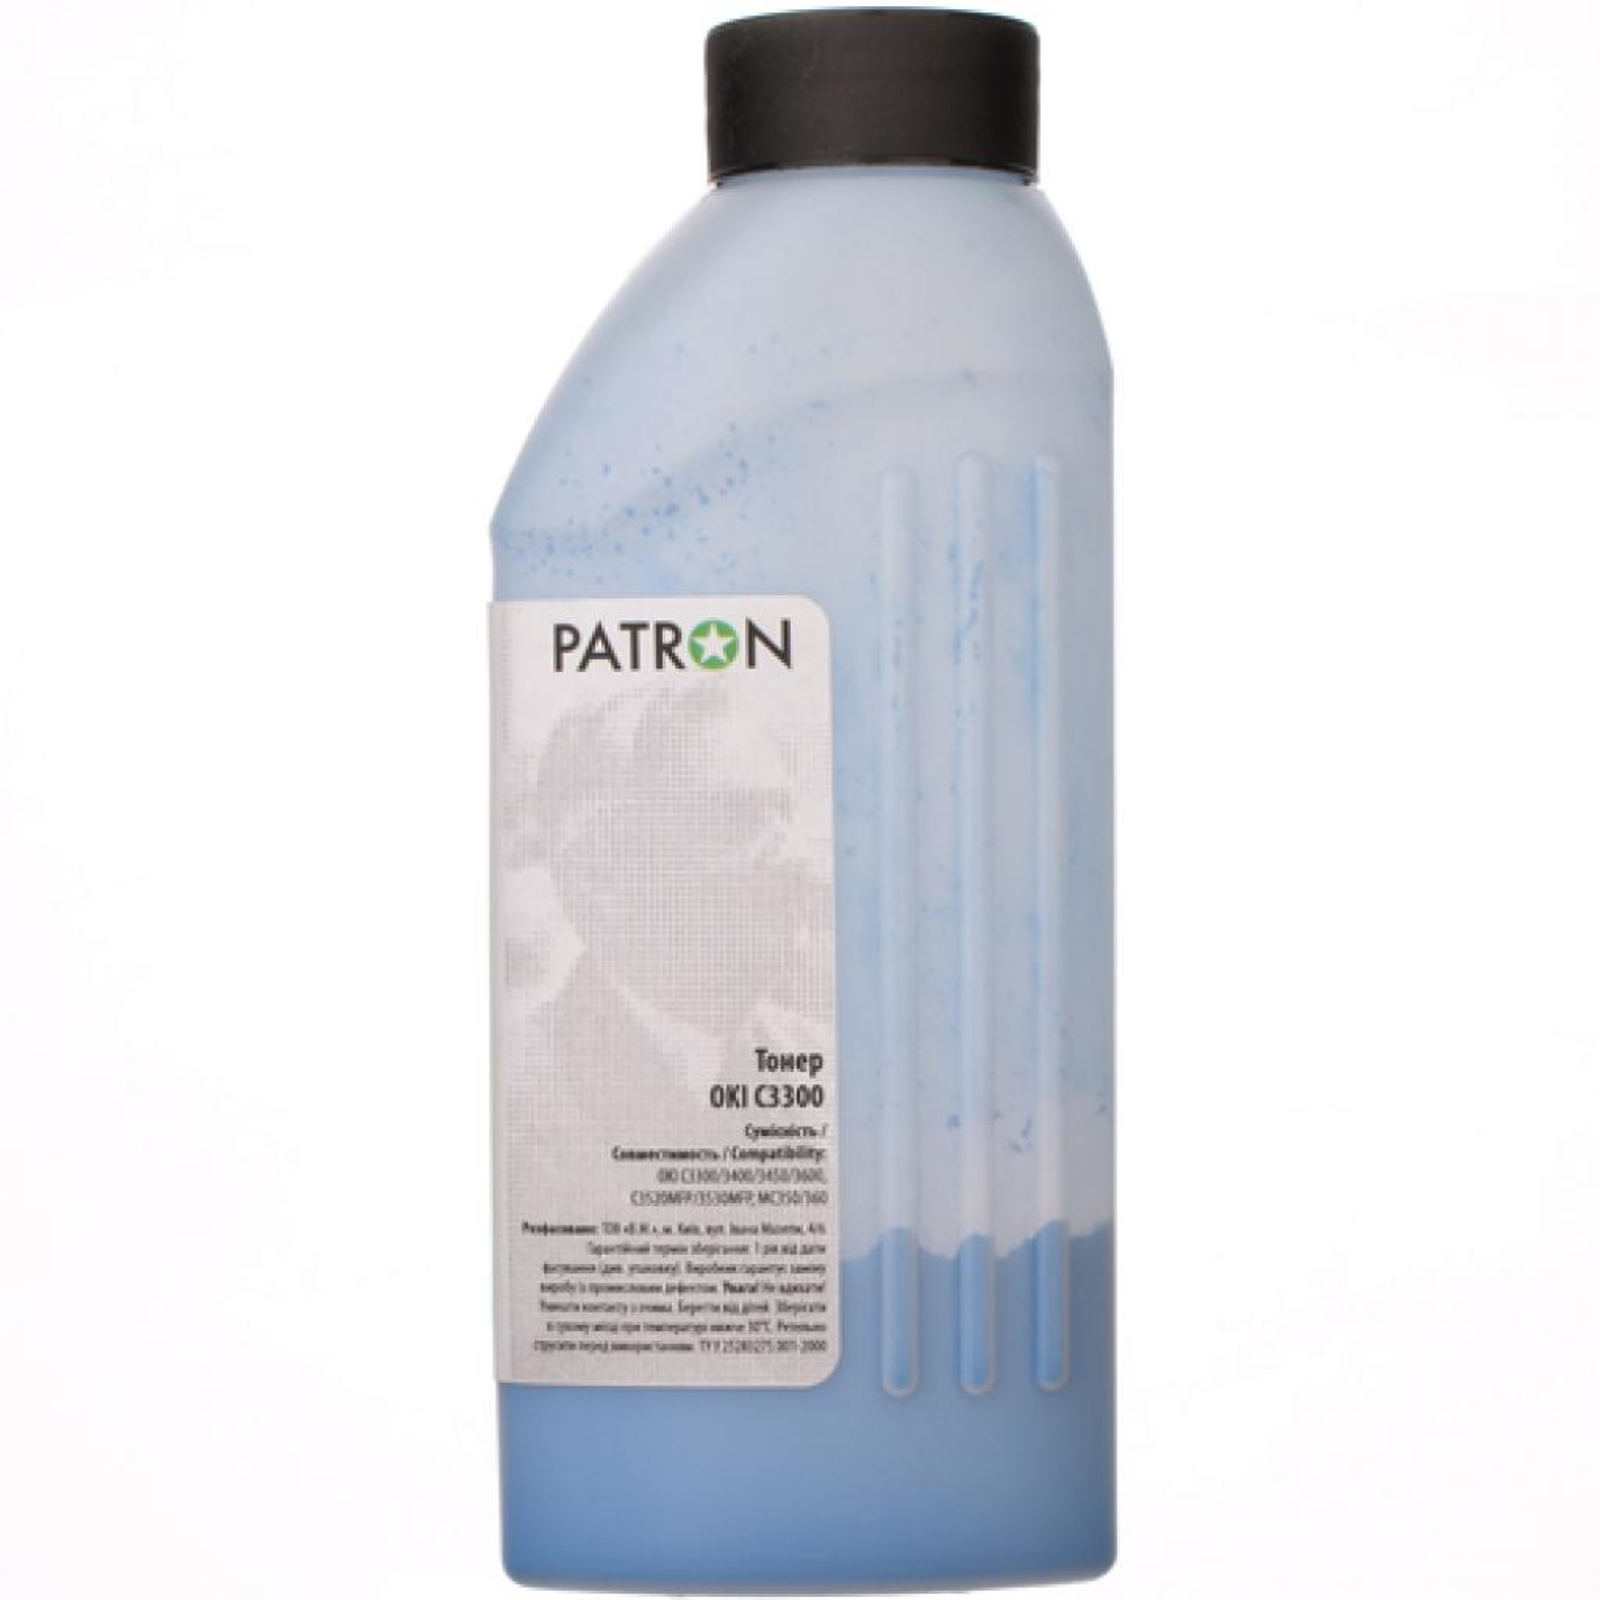 Тонер PATRON OKI C3300 CYAN 50г (T-PN-OC3300-C-050) изображение 2